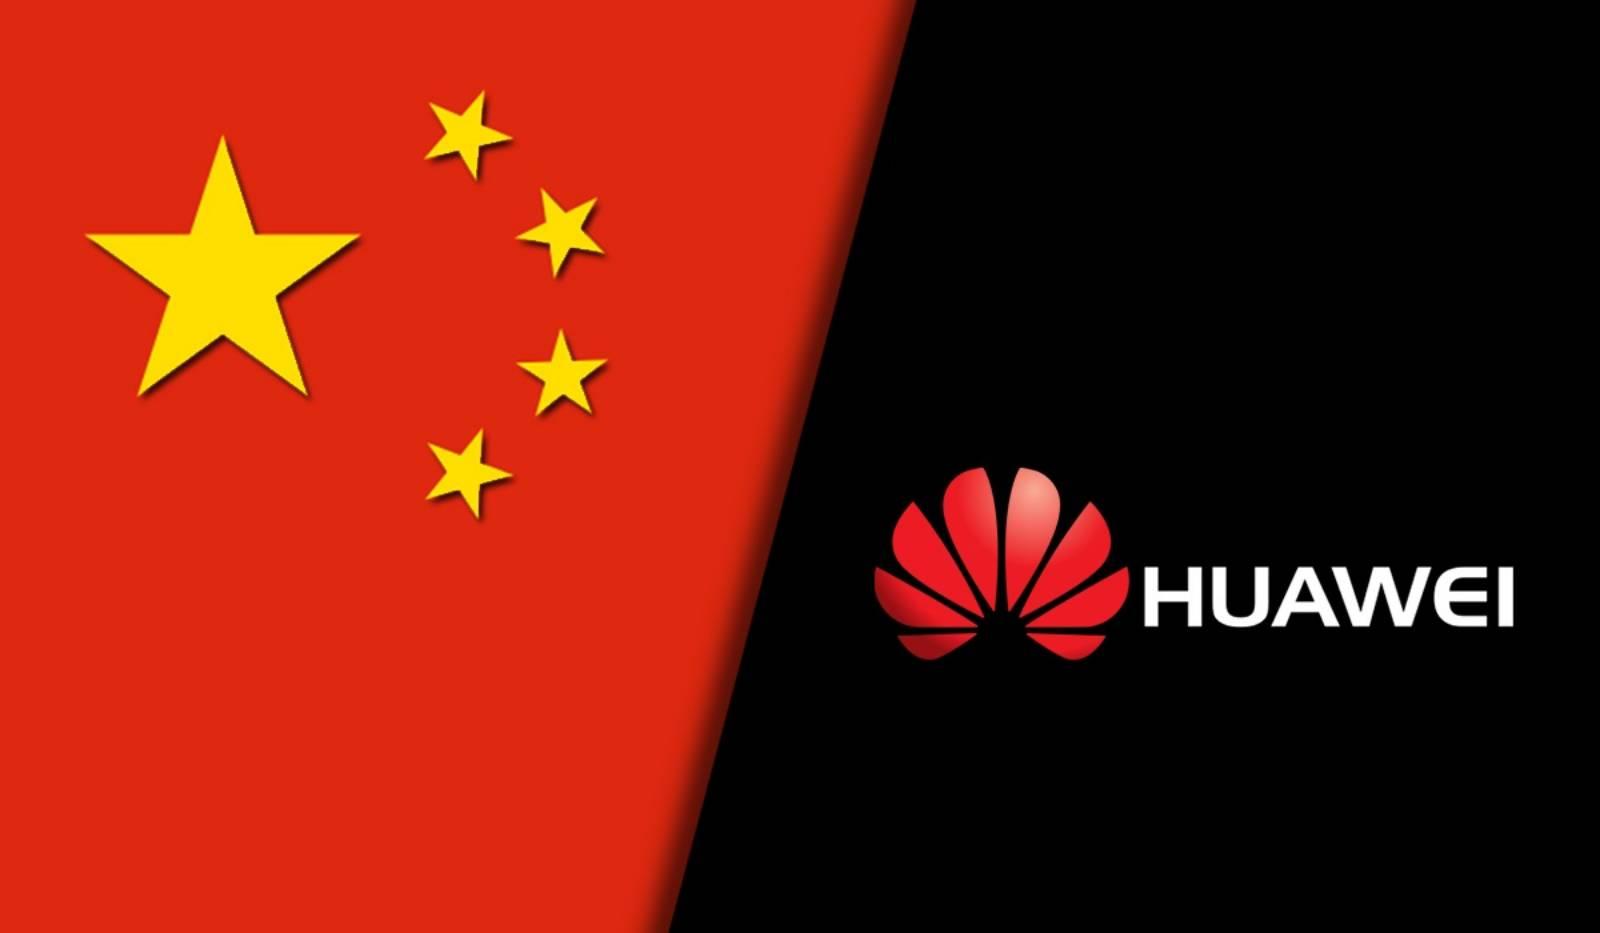 CHINUITA Huawei AMENINTARE PUTERNICA Apple Samsung